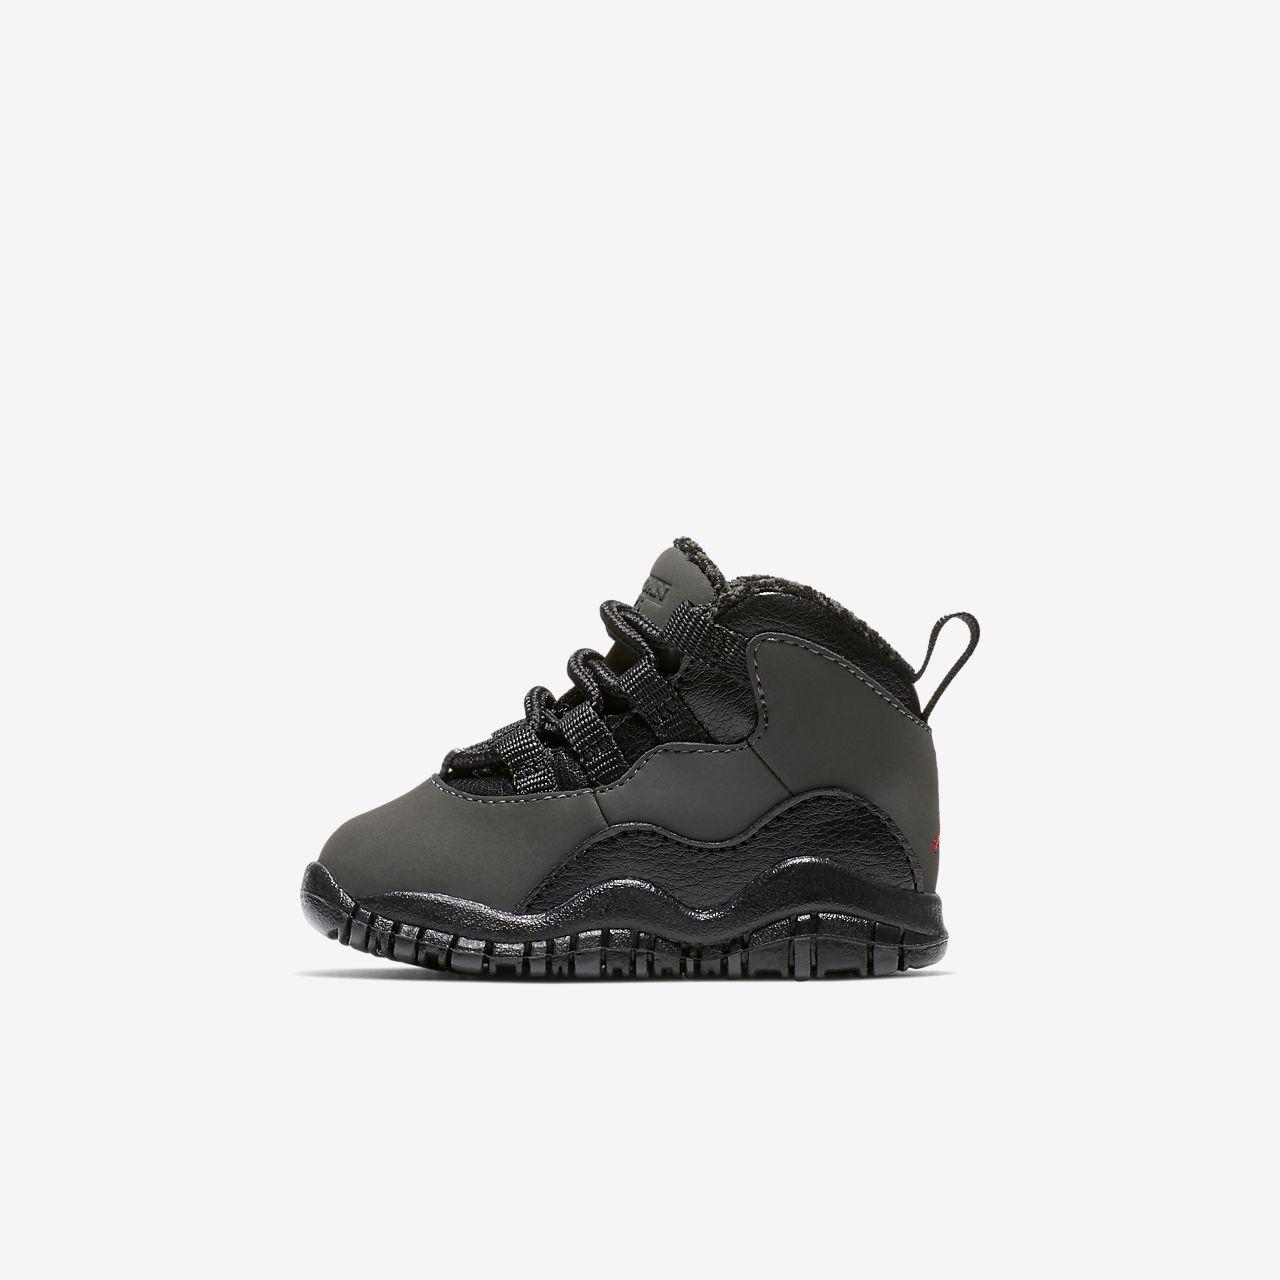 ... Air Jordan Retro 10 (2c-10c) Infant/Toddler Shoe